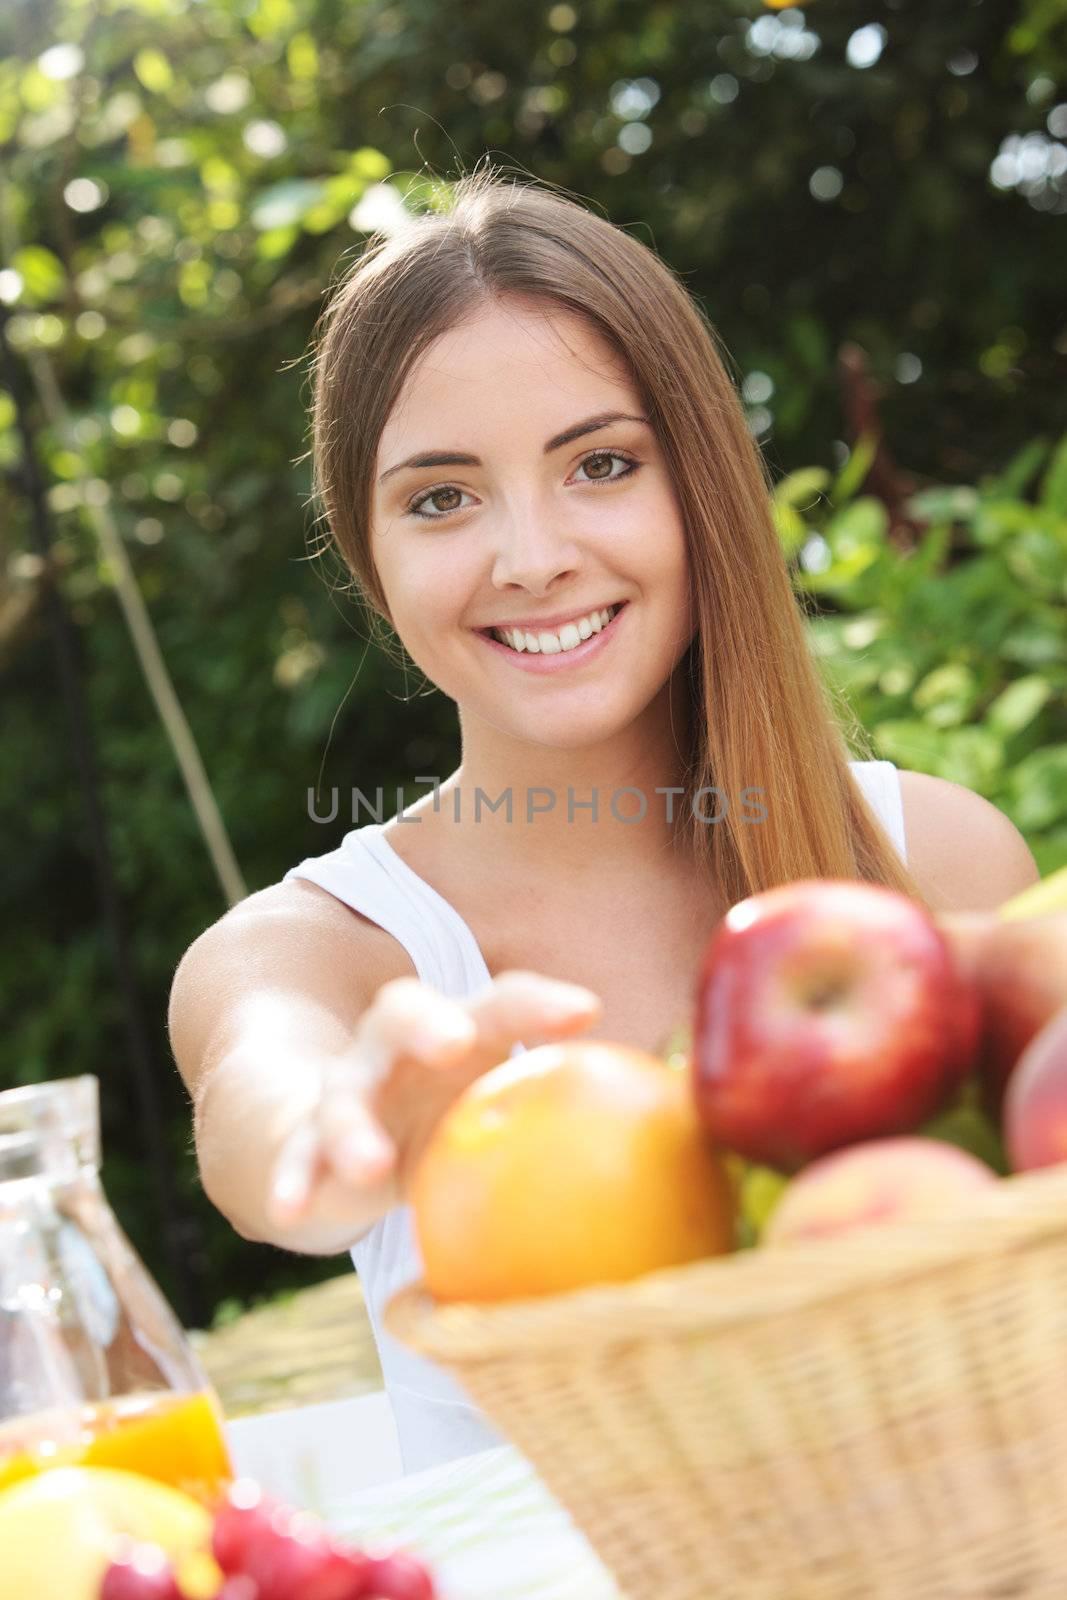 Portrait of a beautiful girl taking an apple